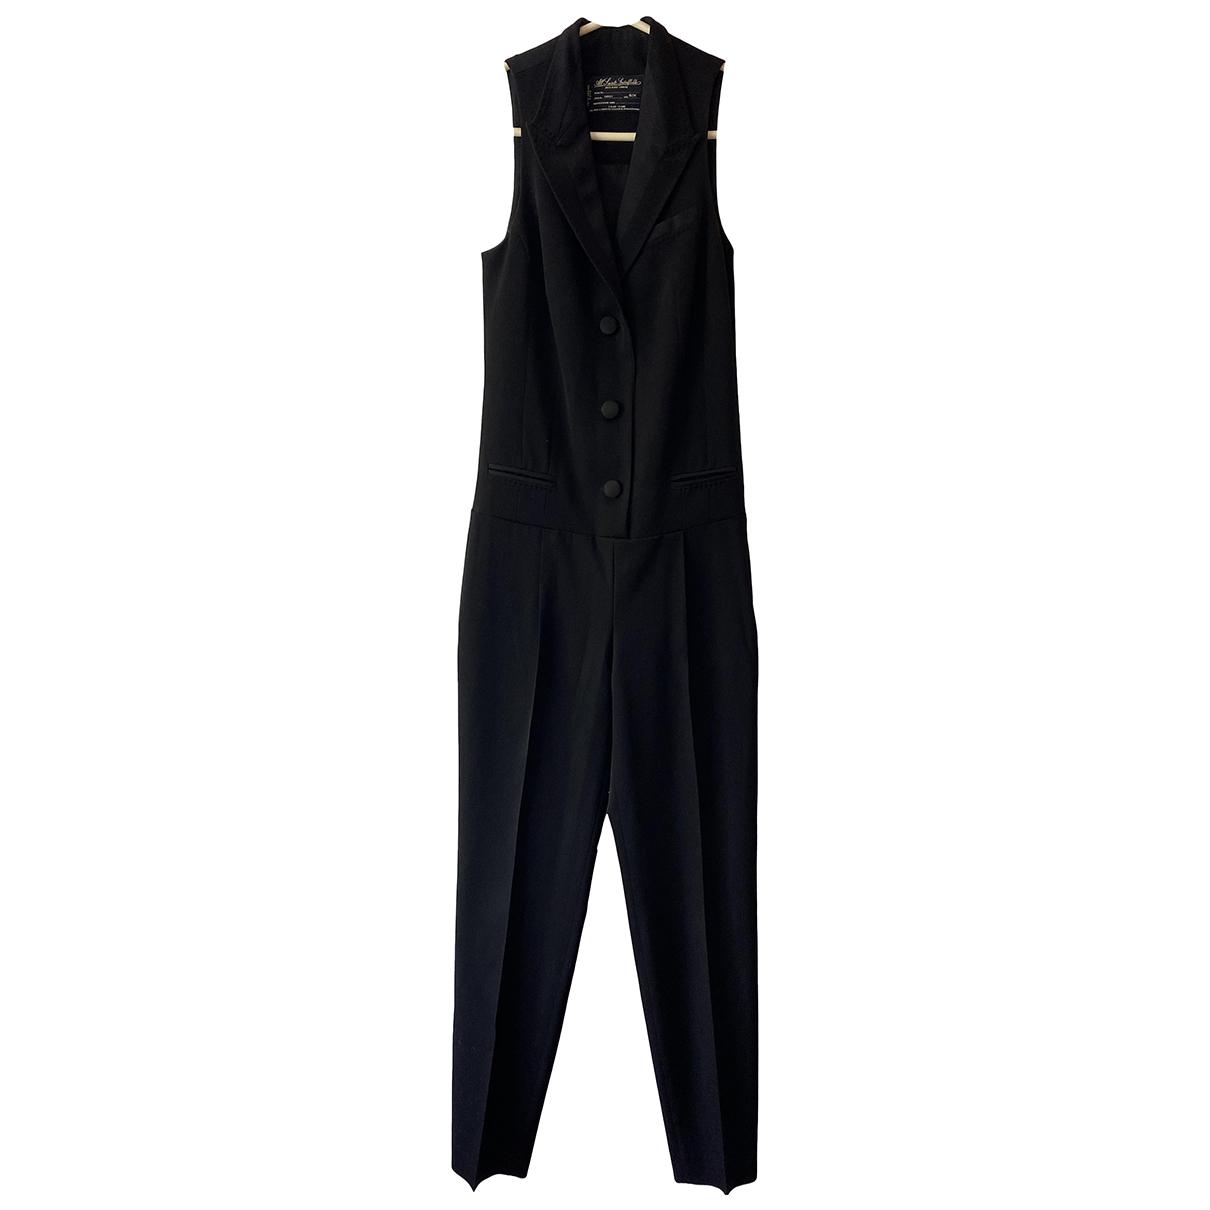 All Saints \N Black Wool jumpsuit for Women 6 UK